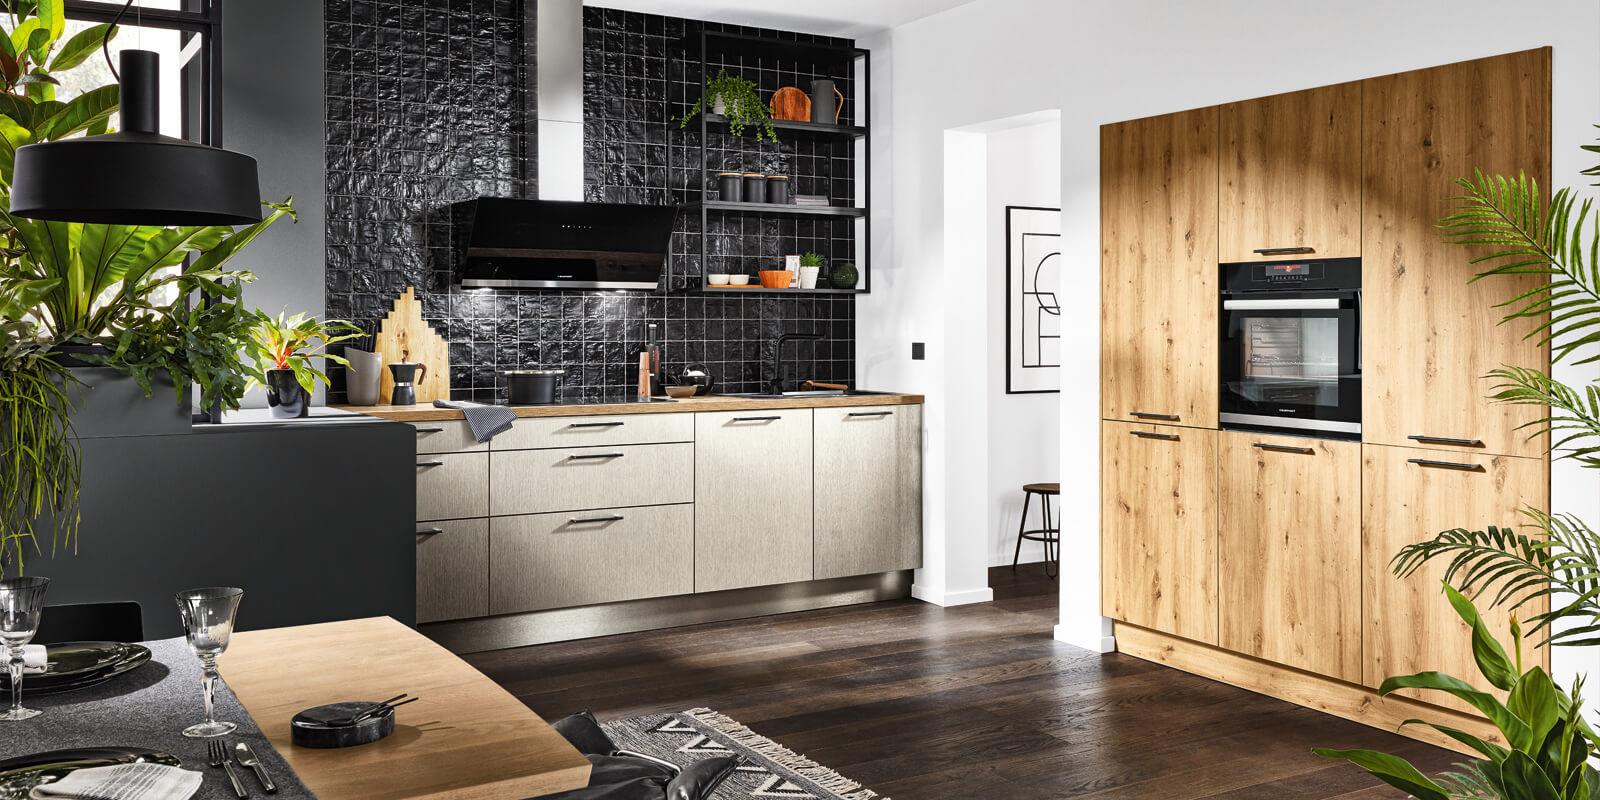 Full Size of Küche Finanzieren Möbel Boss Ikea Küche Finanzieren 0 Küche Finanzieren Student Küche Finanzieren 0 Prozent Küche Küche Finanzieren